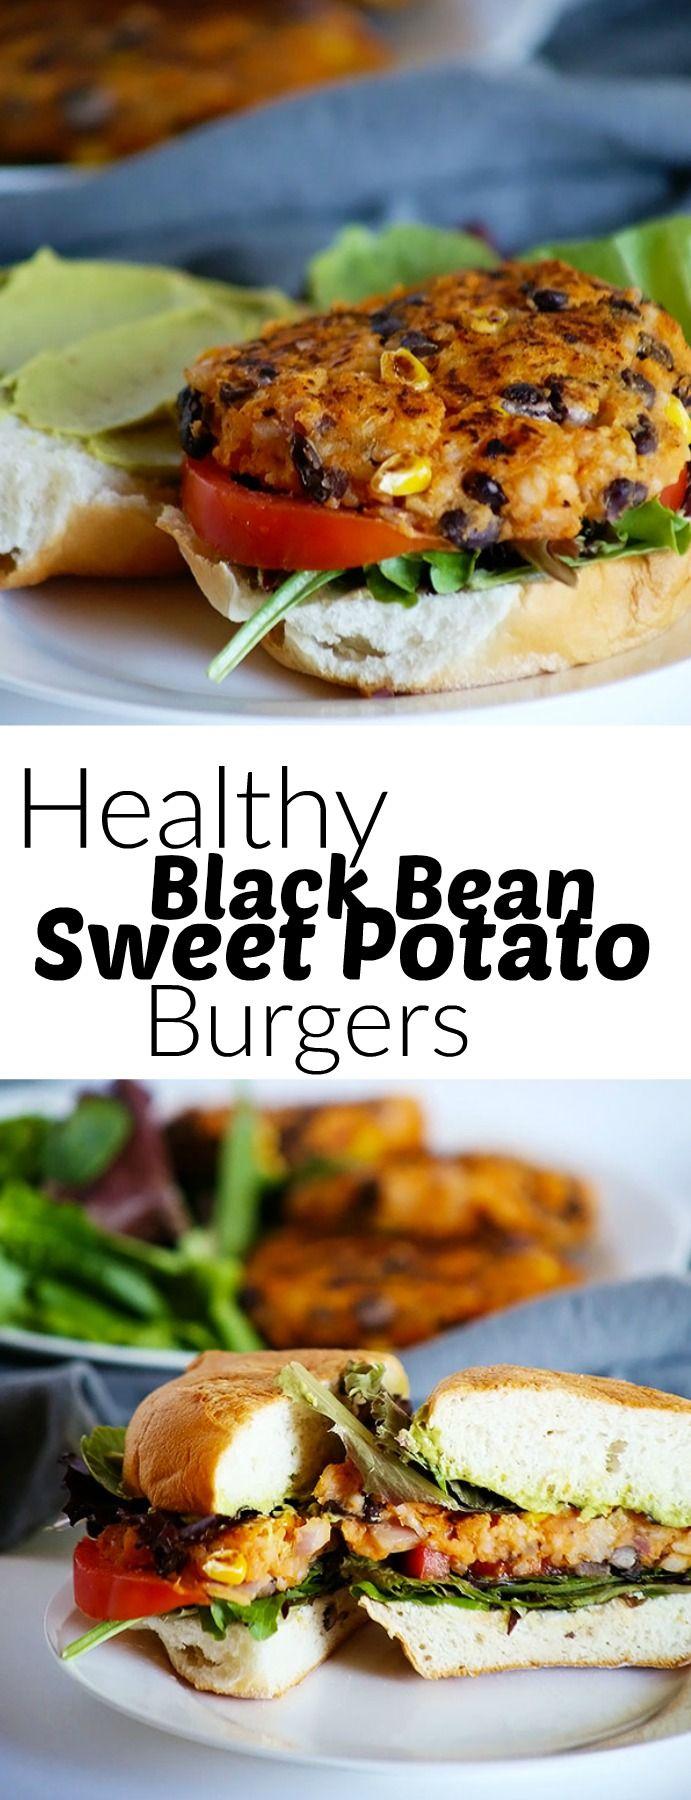 Healthy Black Bean Sweet Potato Burgers Recipe Sweet Potato Burgers Food Recipes Healthy